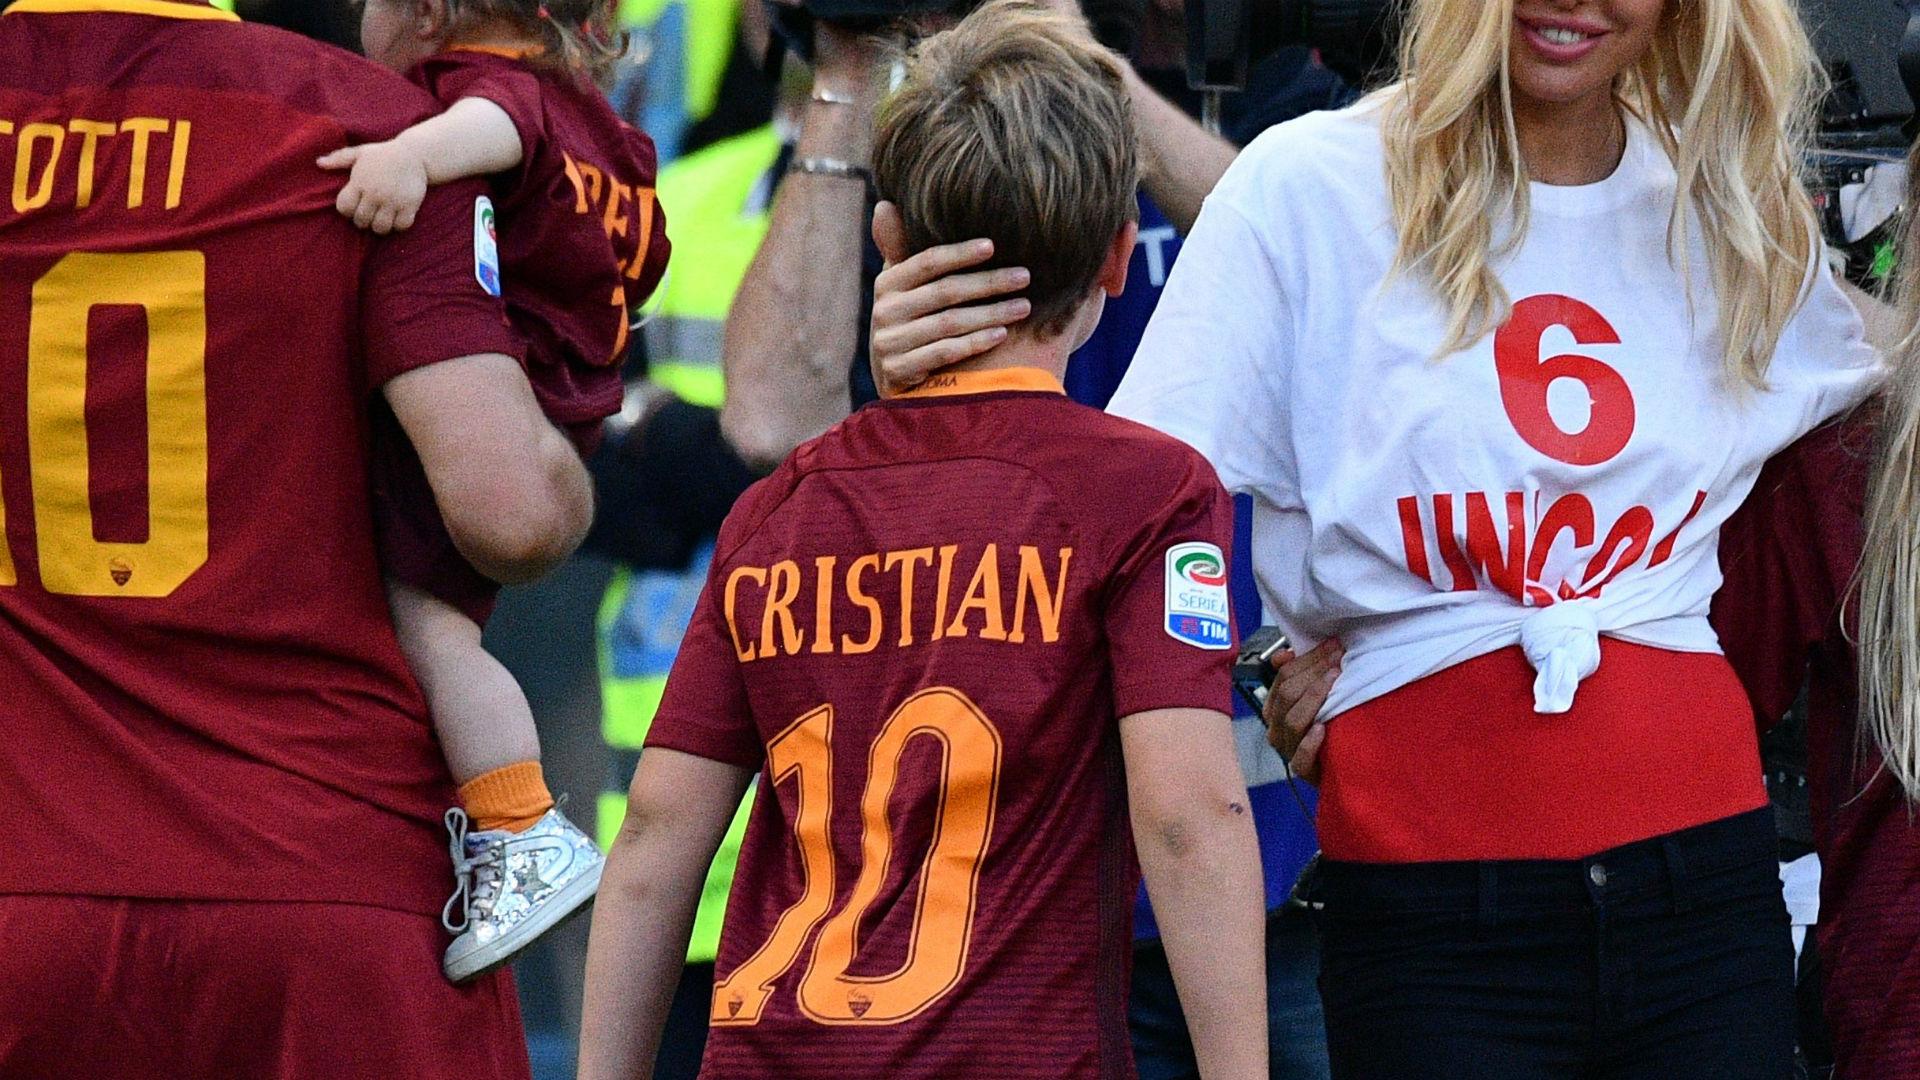 Fair-play e inglese,Totti jr da applausi